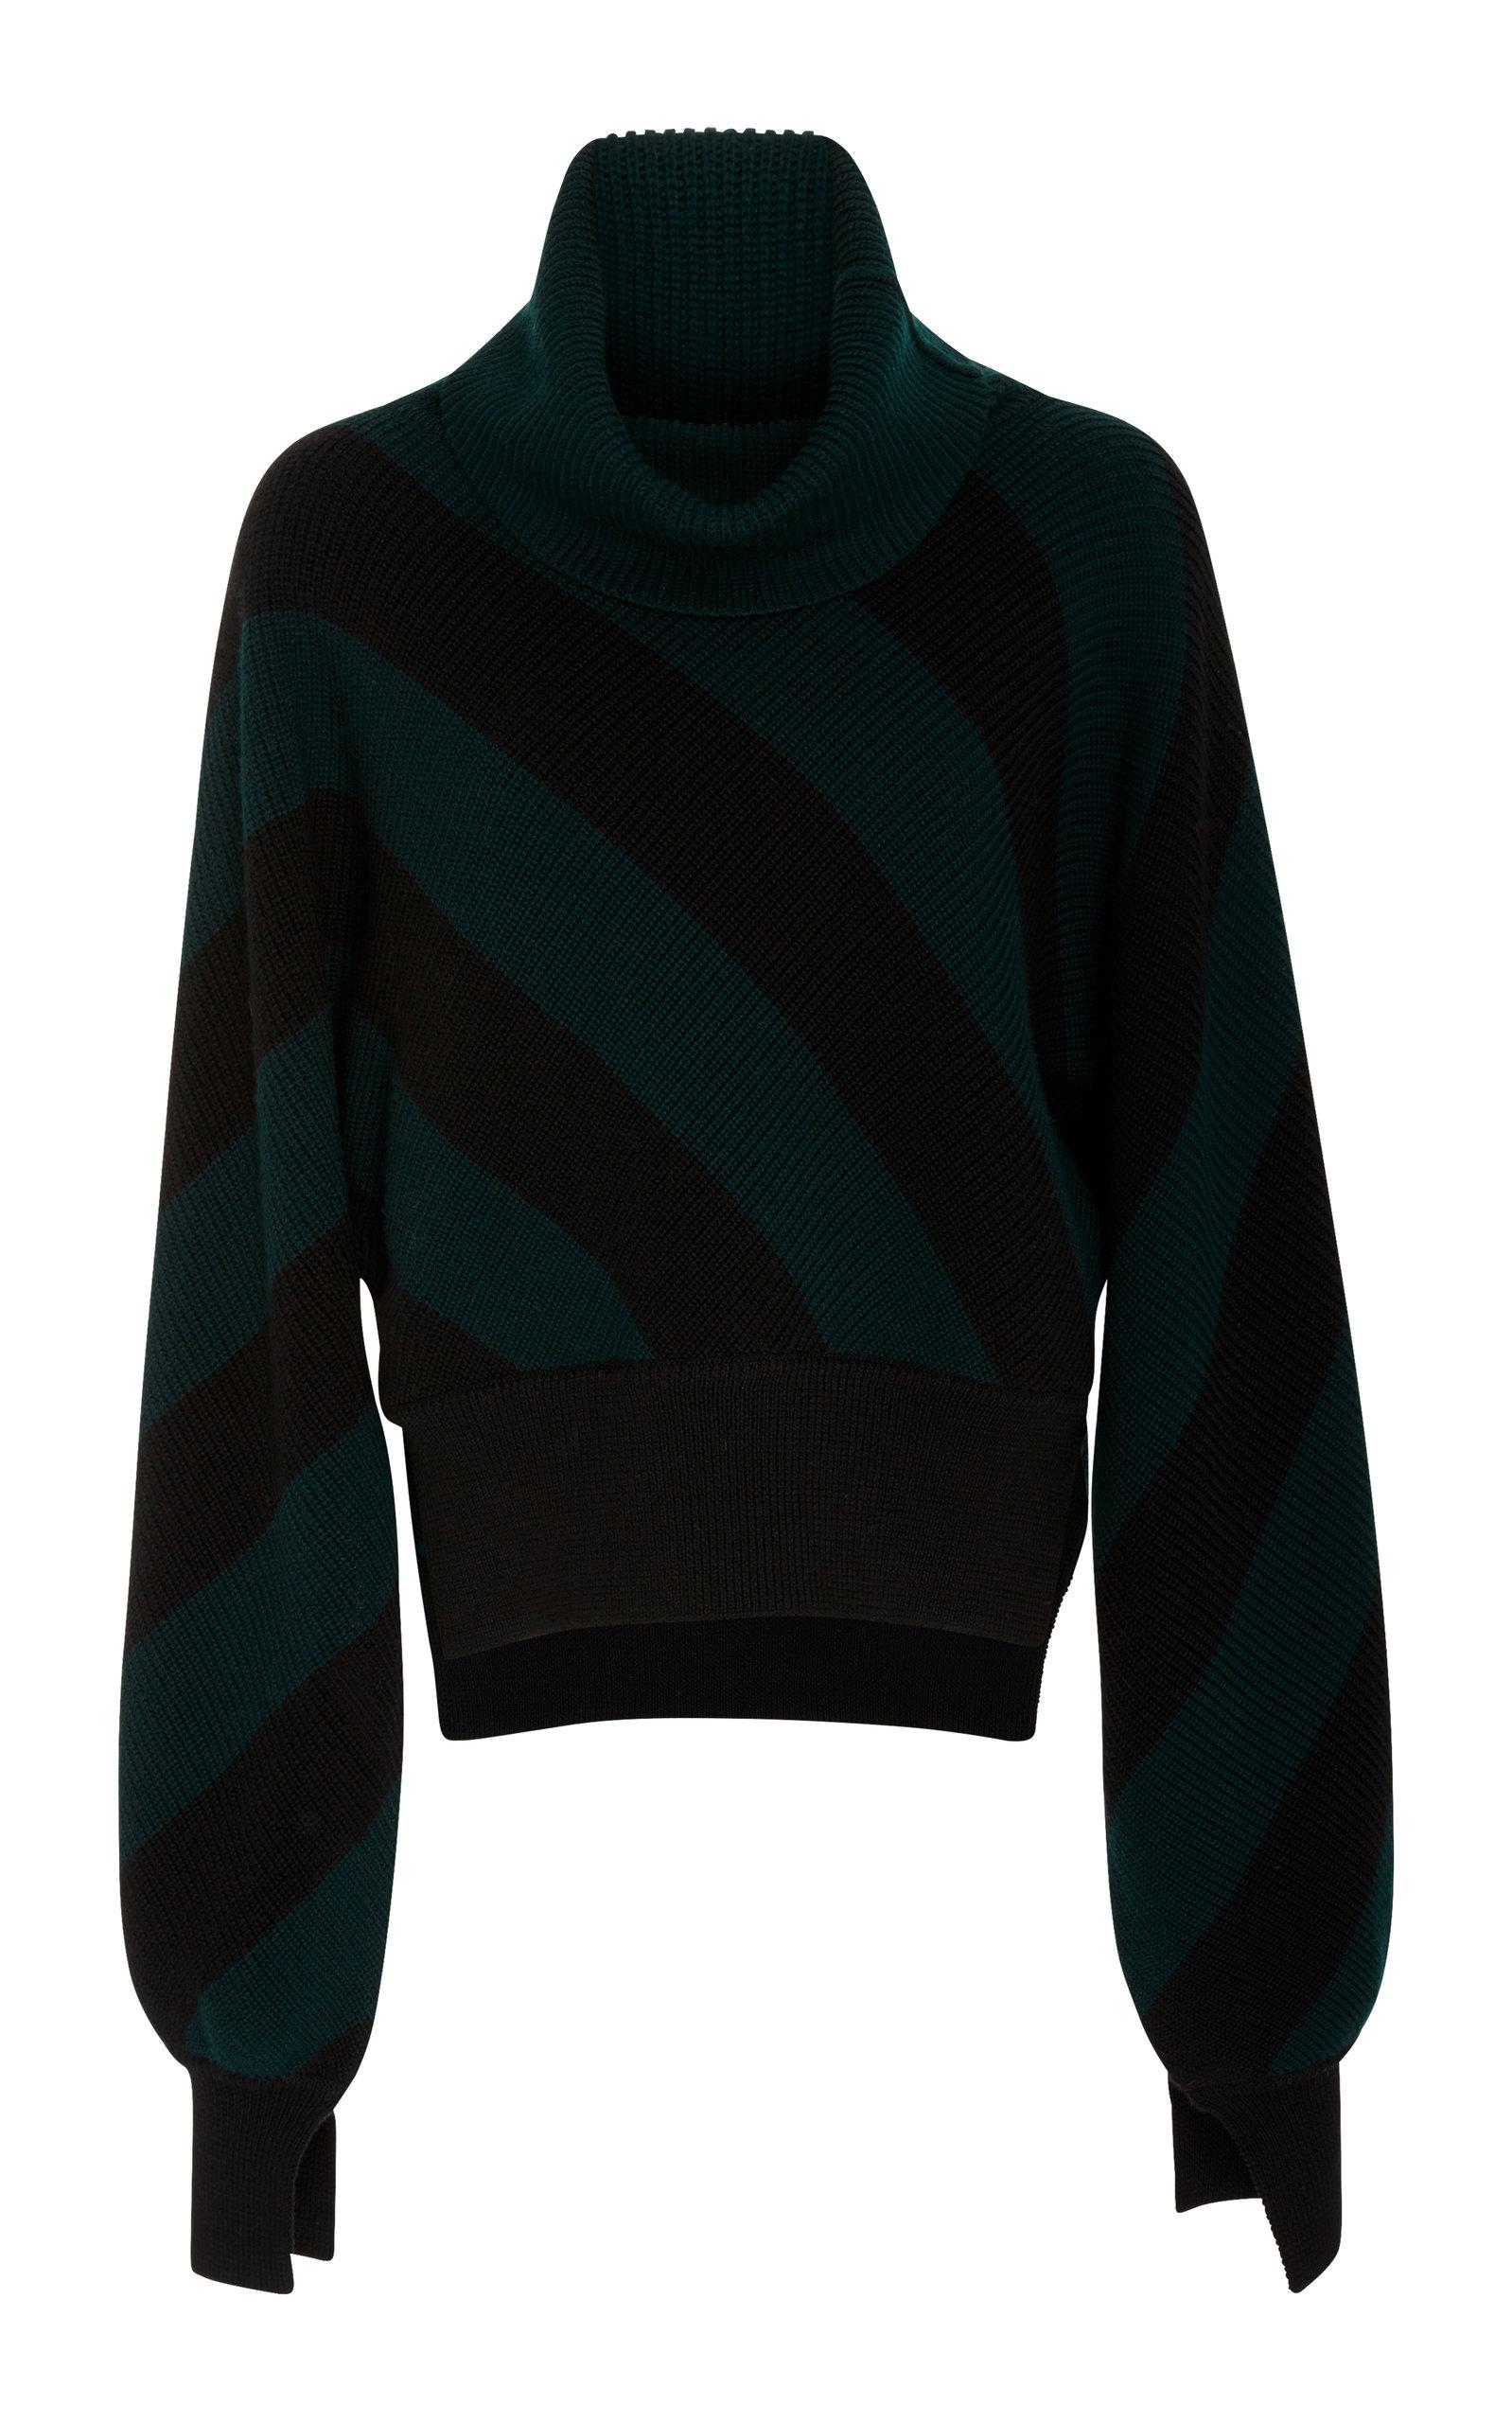 MONSE Diagonal Stripe Turtleneck Sweater in Green | ModeSens